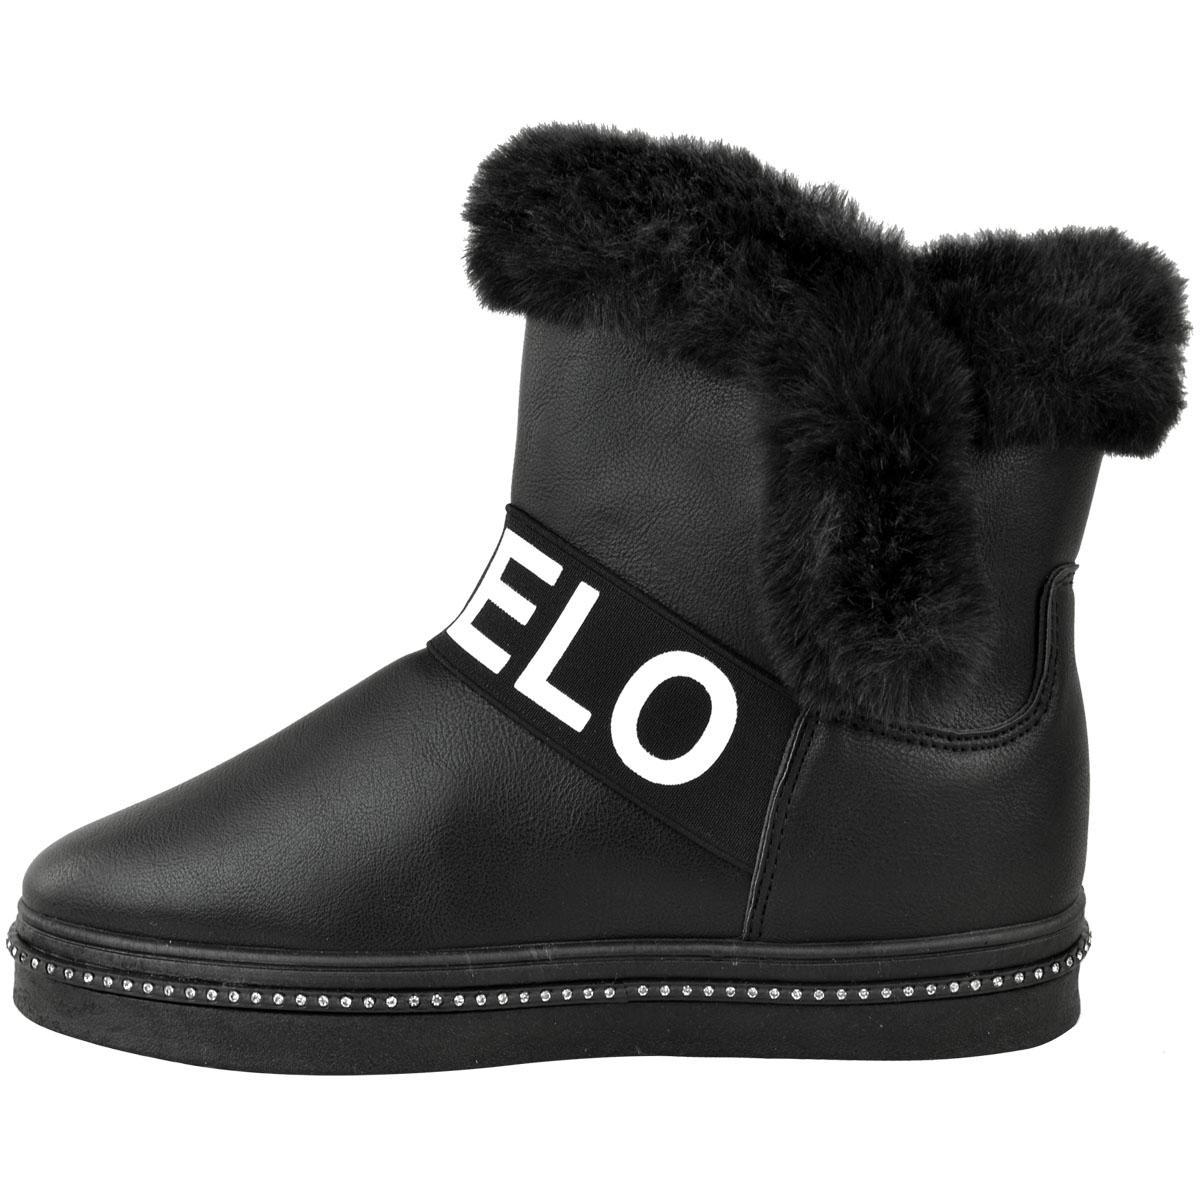 Womens Ladies Flat Love Snugg Boots Snow Winter Faux Fur Fleece Lined Warm Size